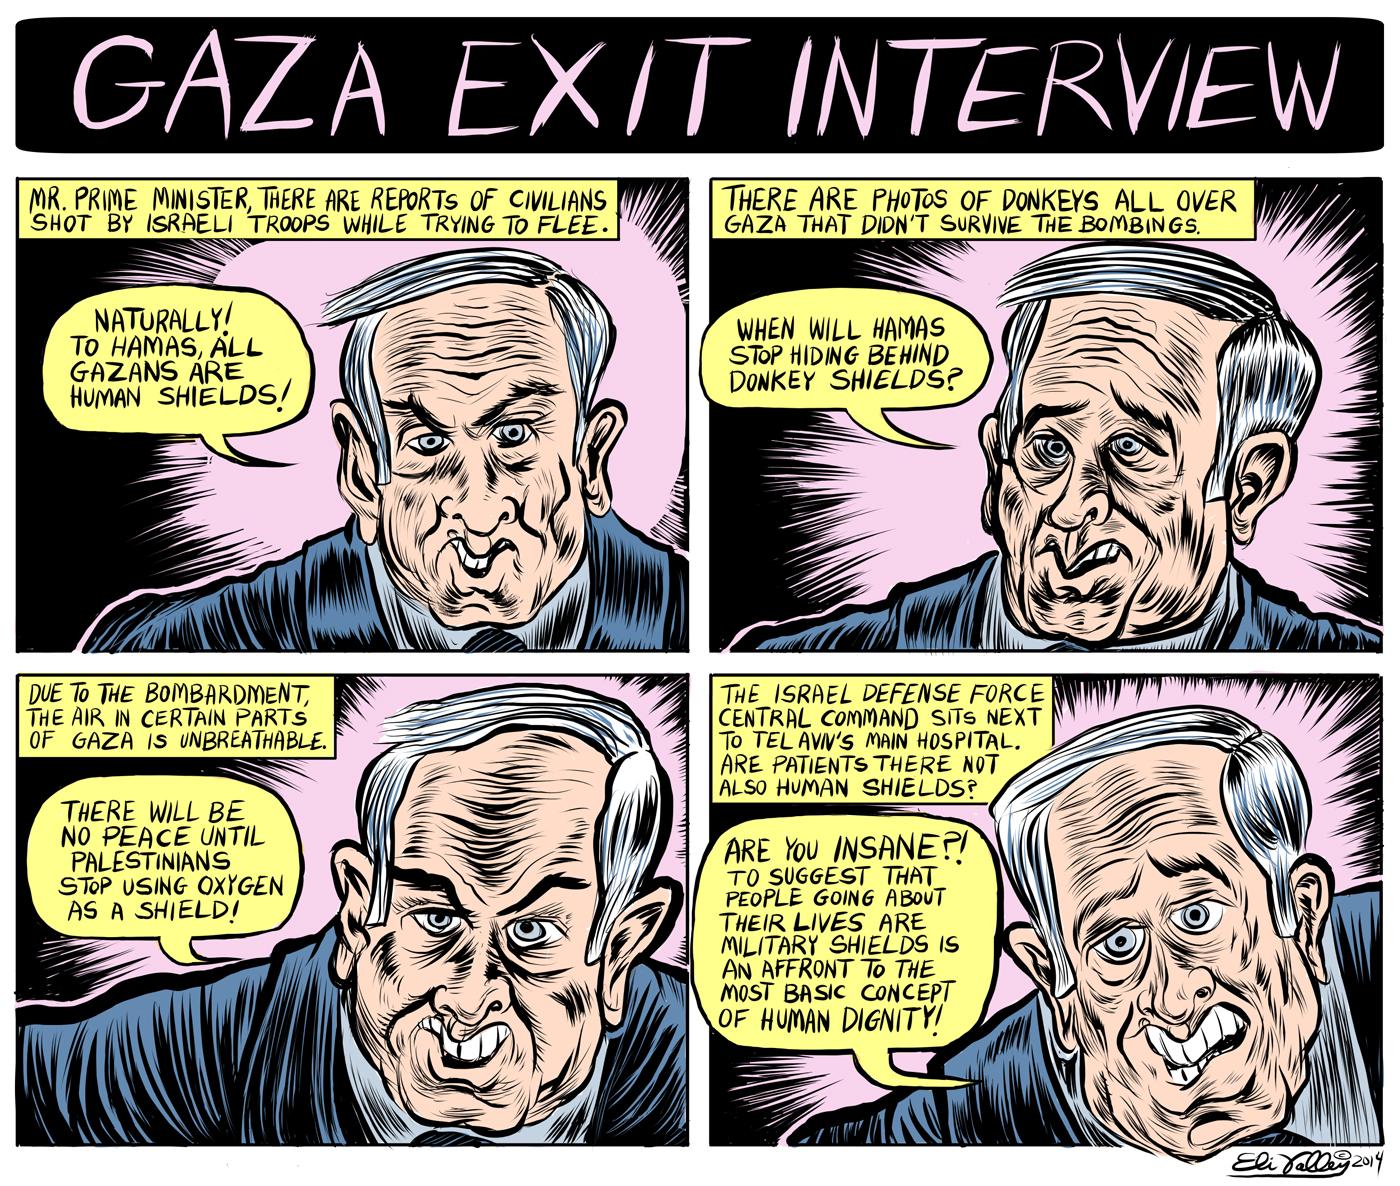 Eli.Valley.Netanyahu.Gaza.Exit.Interview